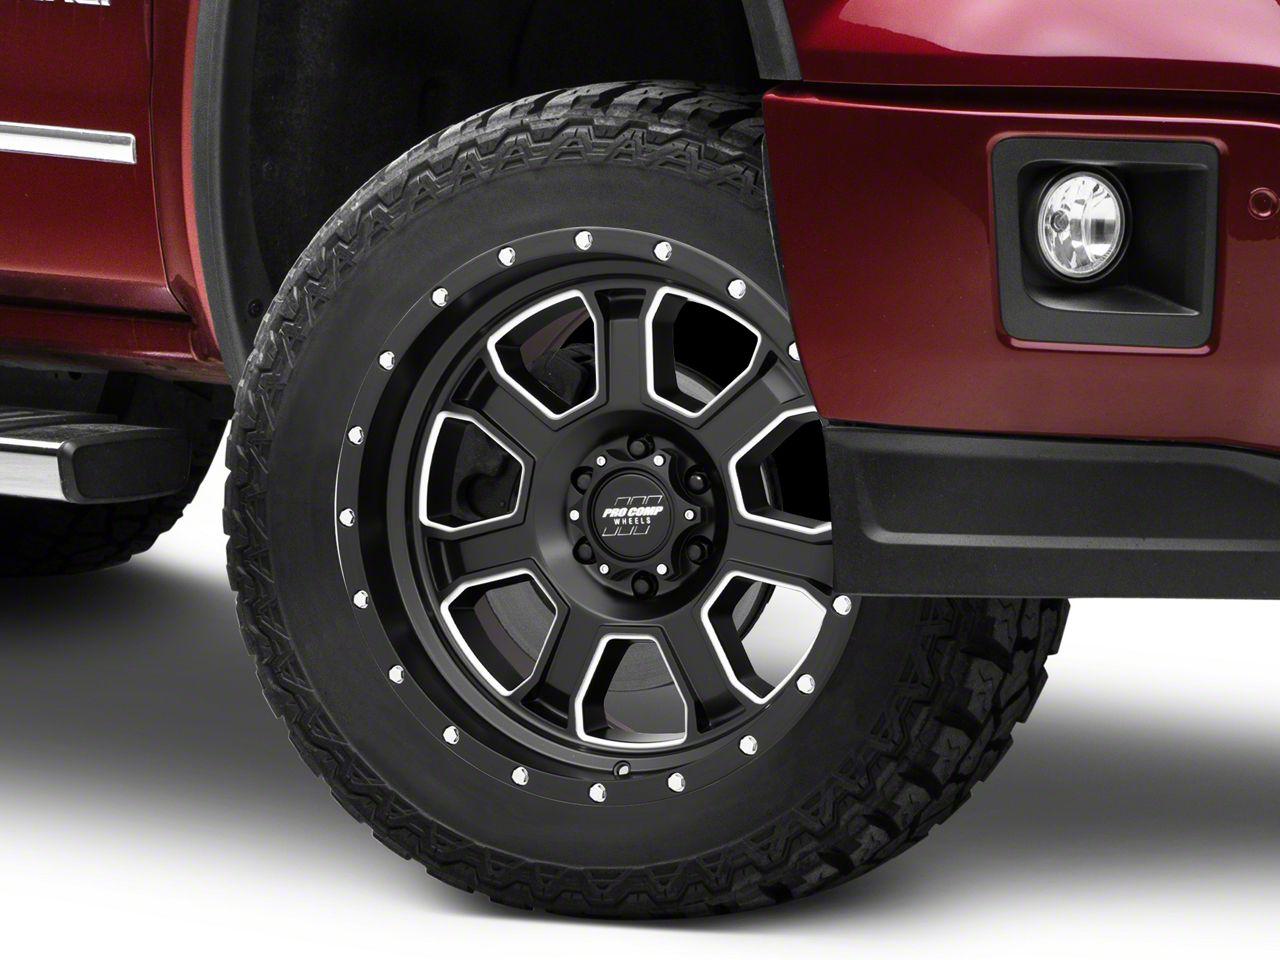 Pro Comp Sledge Satin Black Milled 6-Lug Wheel - 20x9 (07-18 Sierra 1500)